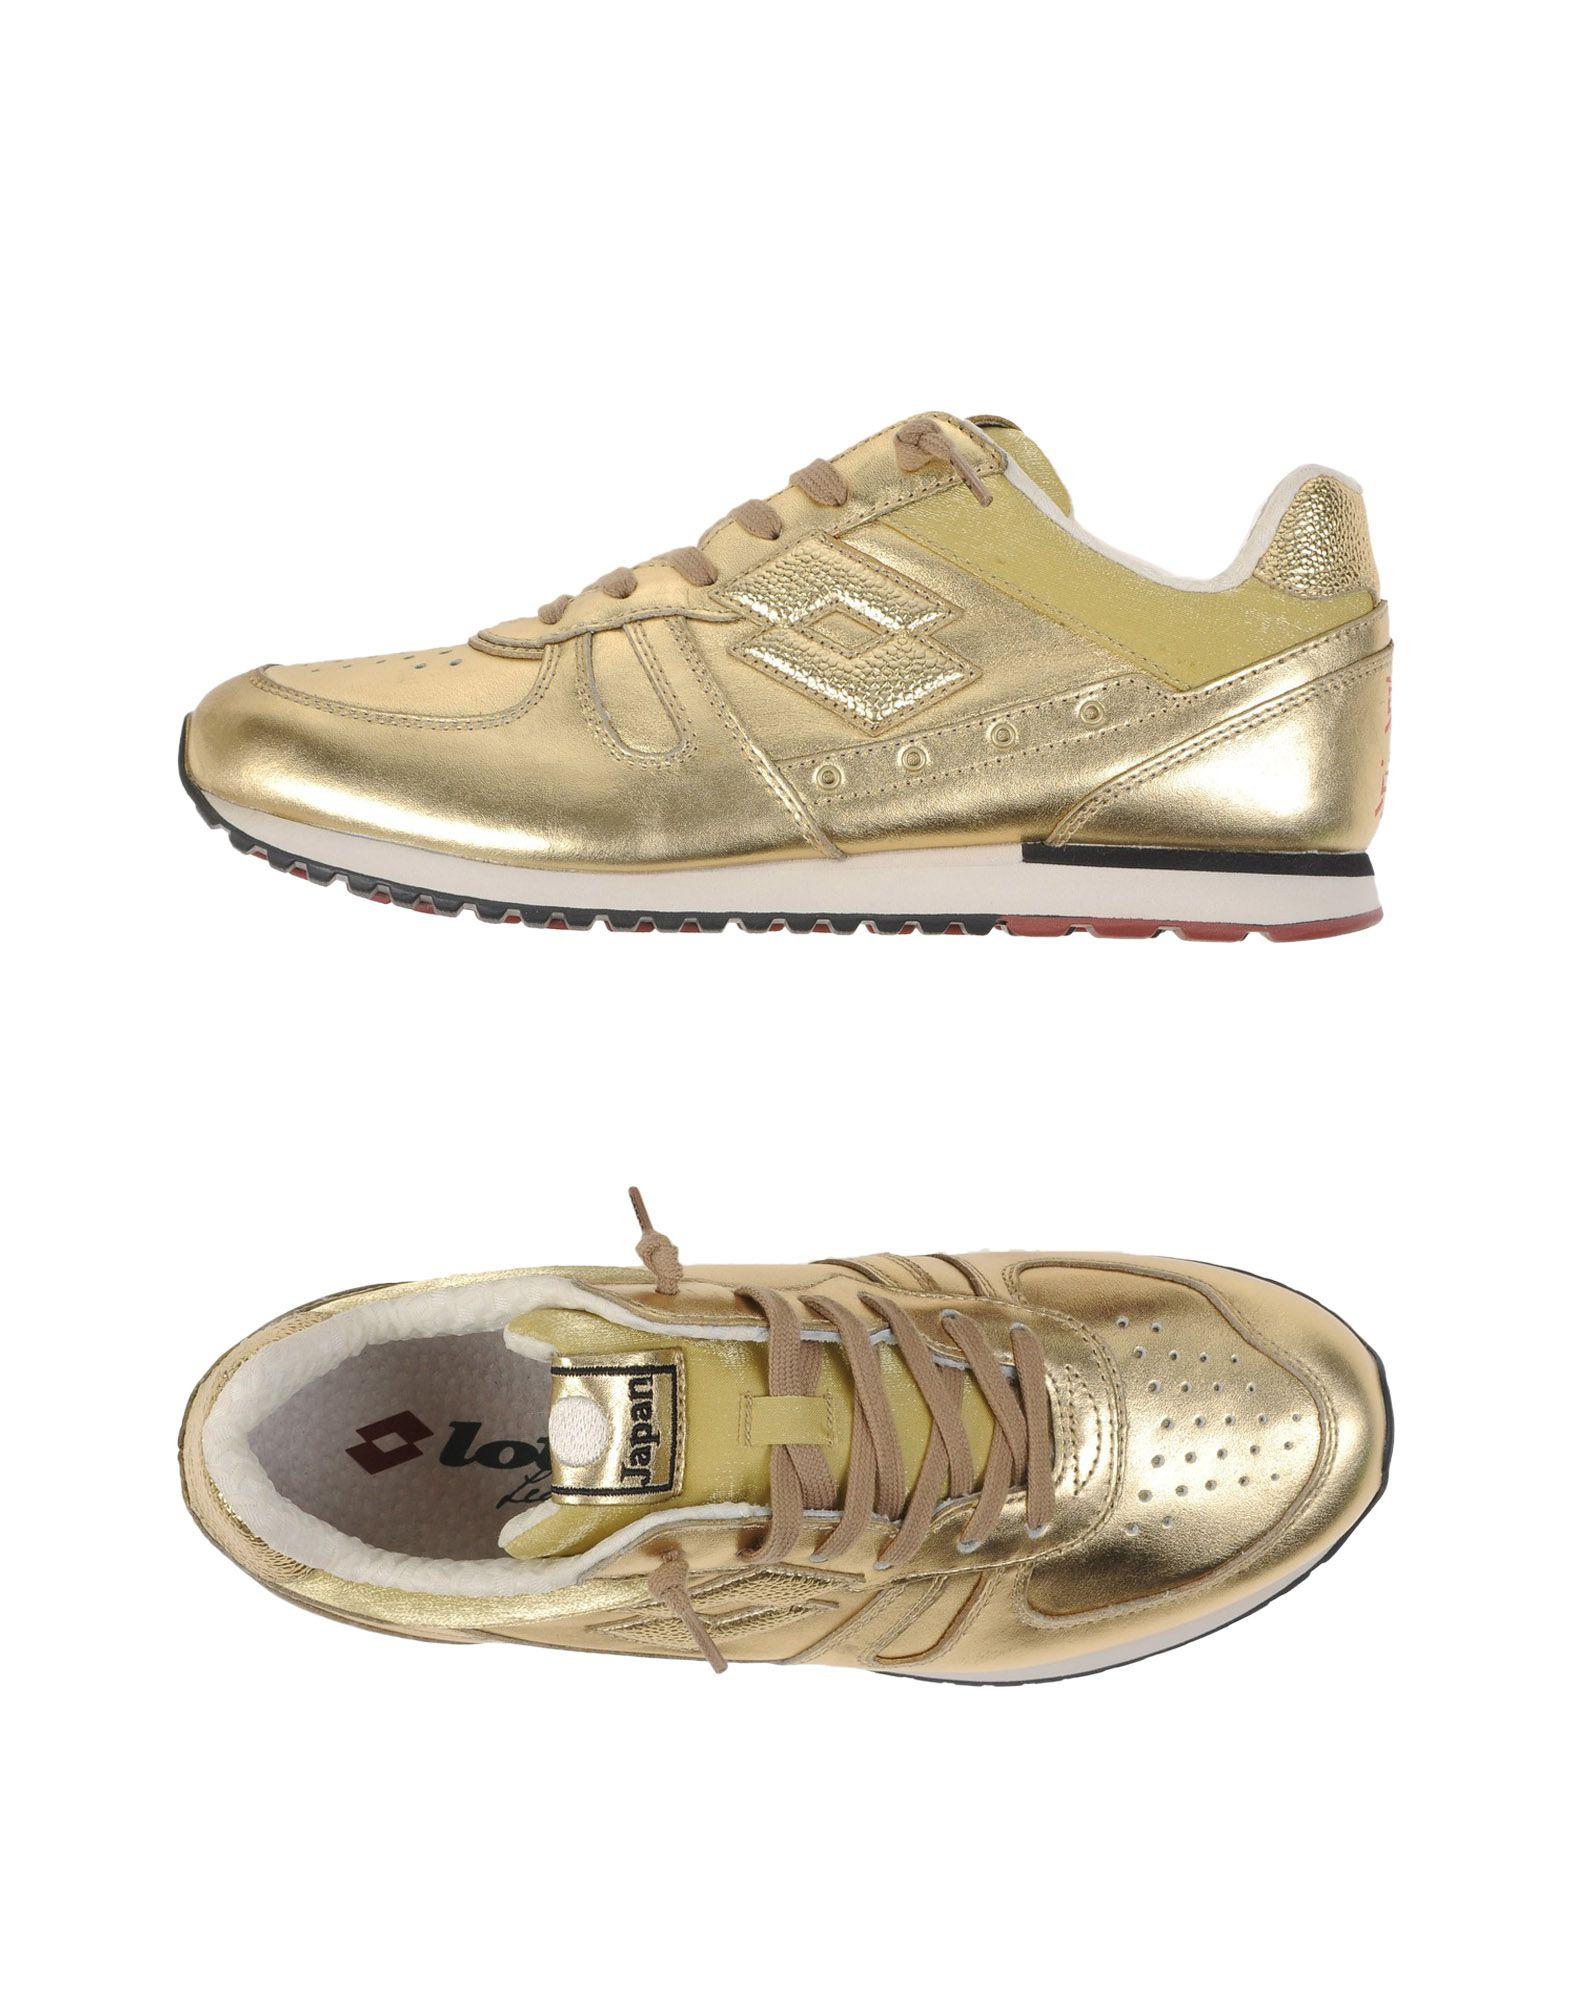 Sneakers Lotto Leggenda Tokyo Shibuya W Metallic Leather - Donna - Acquista online su